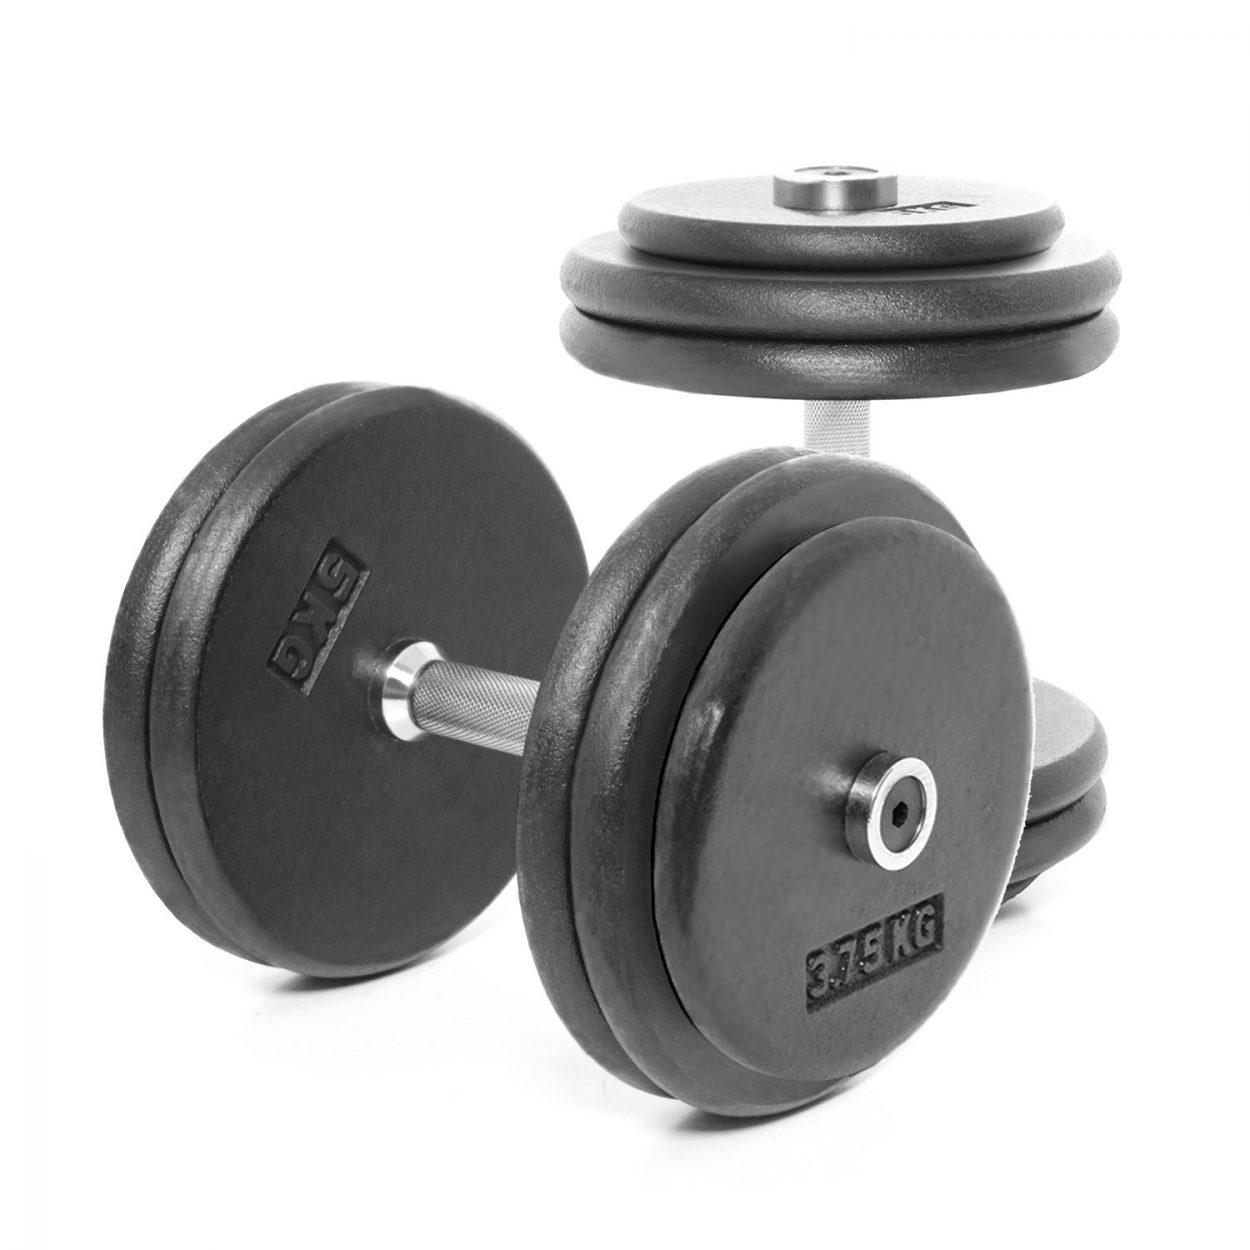 Body Power Pro-style Dumbbells 27.5kg (x2)